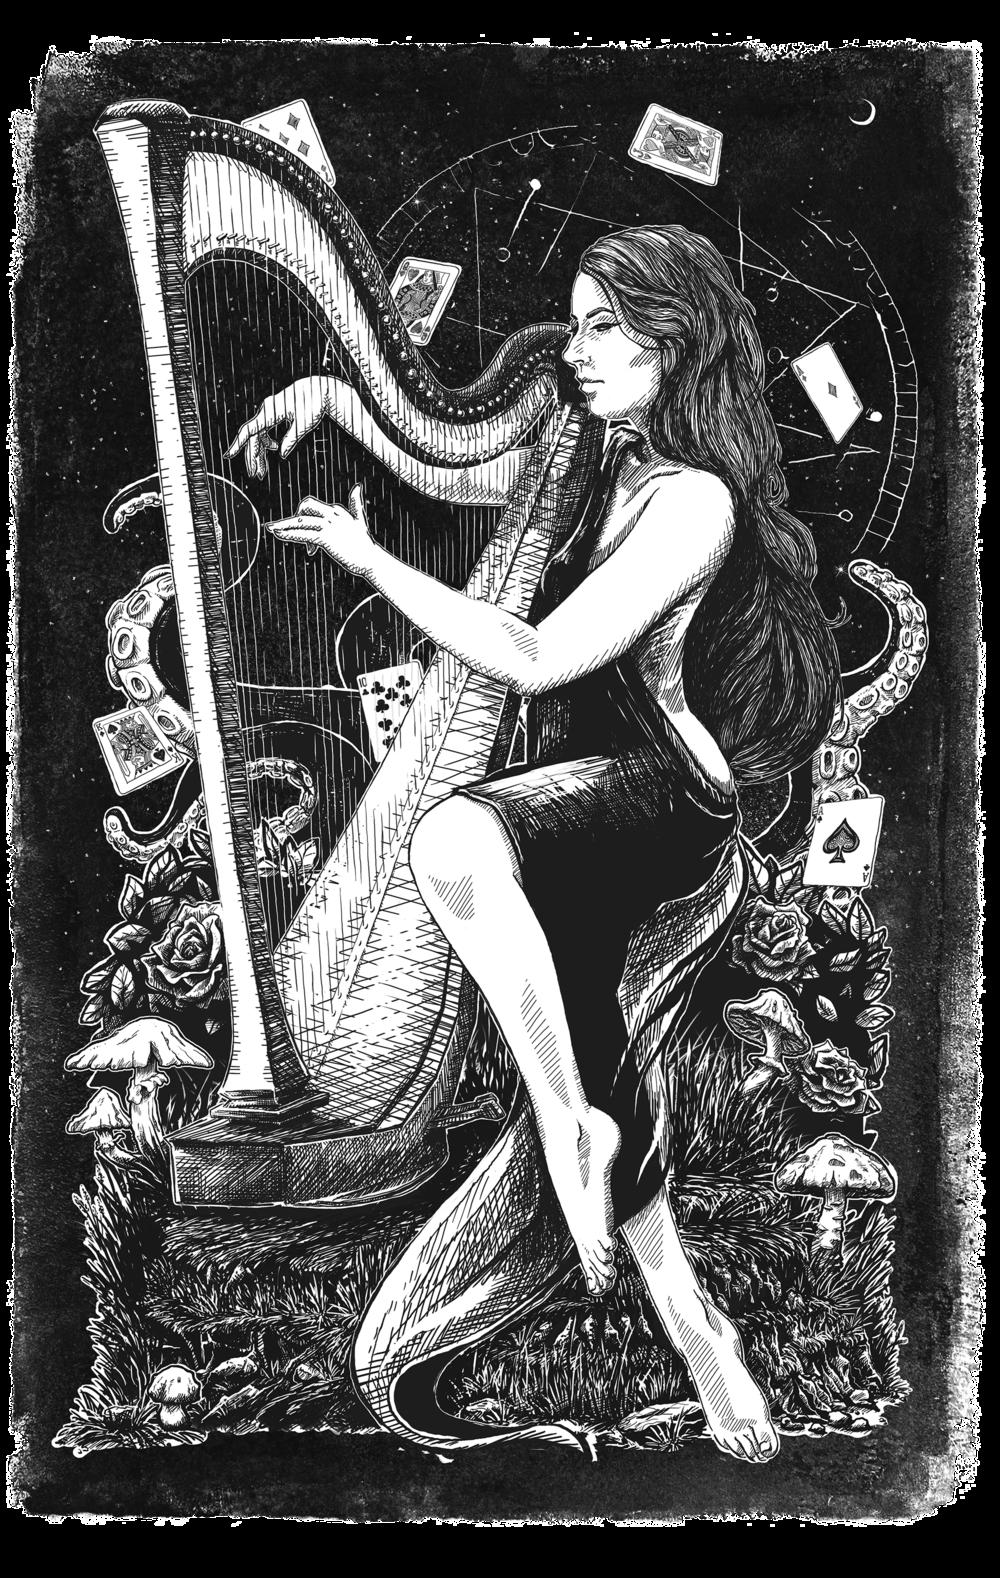 amy turk dark hand drawn illustration music commission alice wonderland